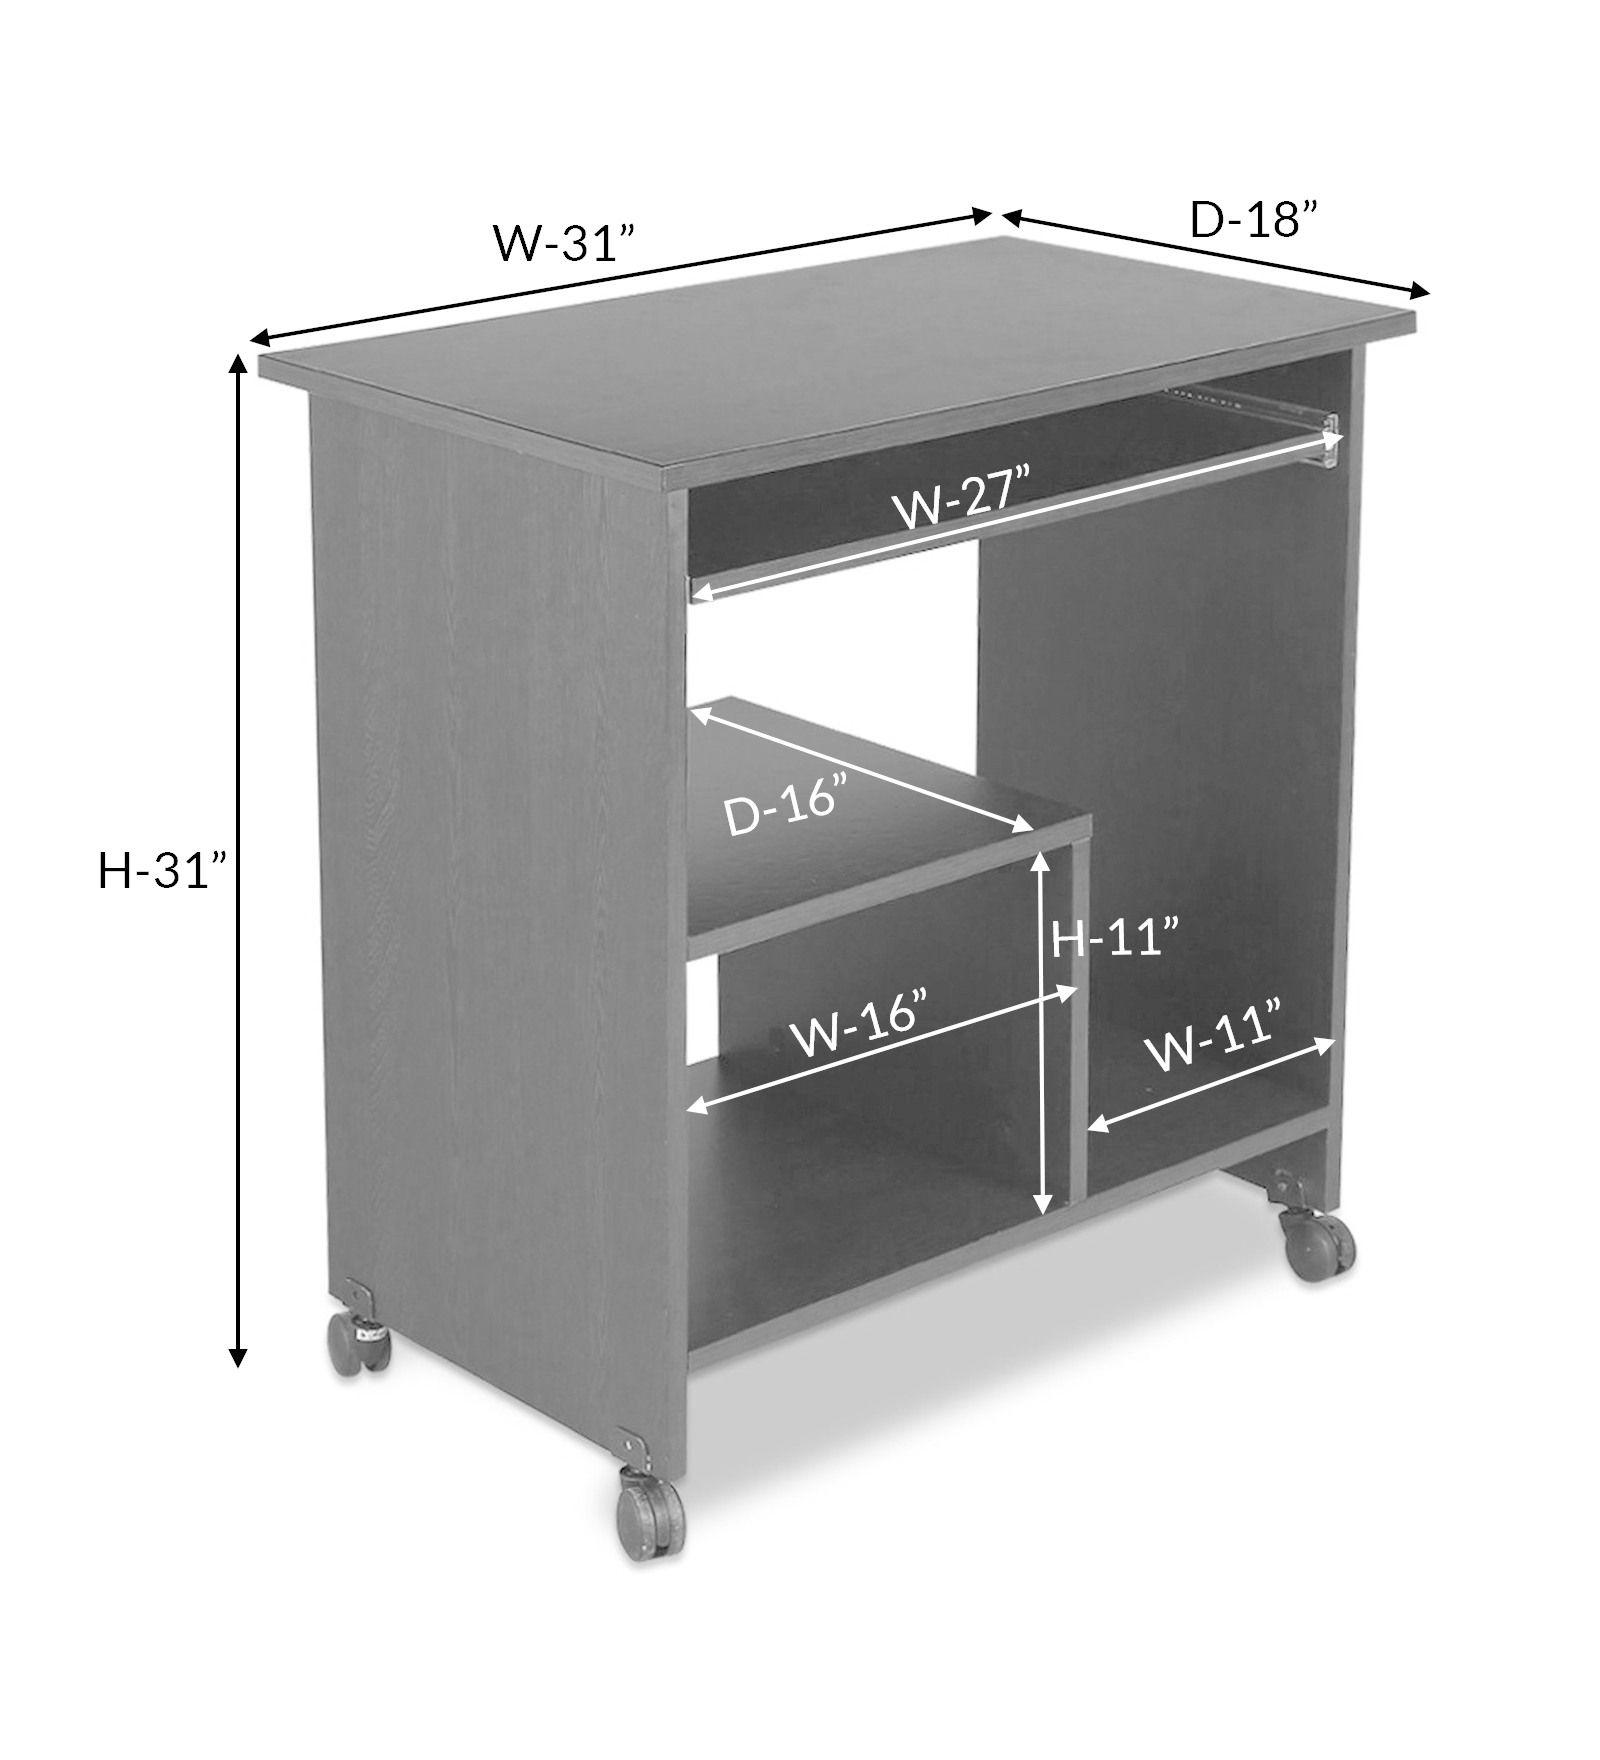 Crystal Furnitech Engineered Wood puter Desk Straight Finish